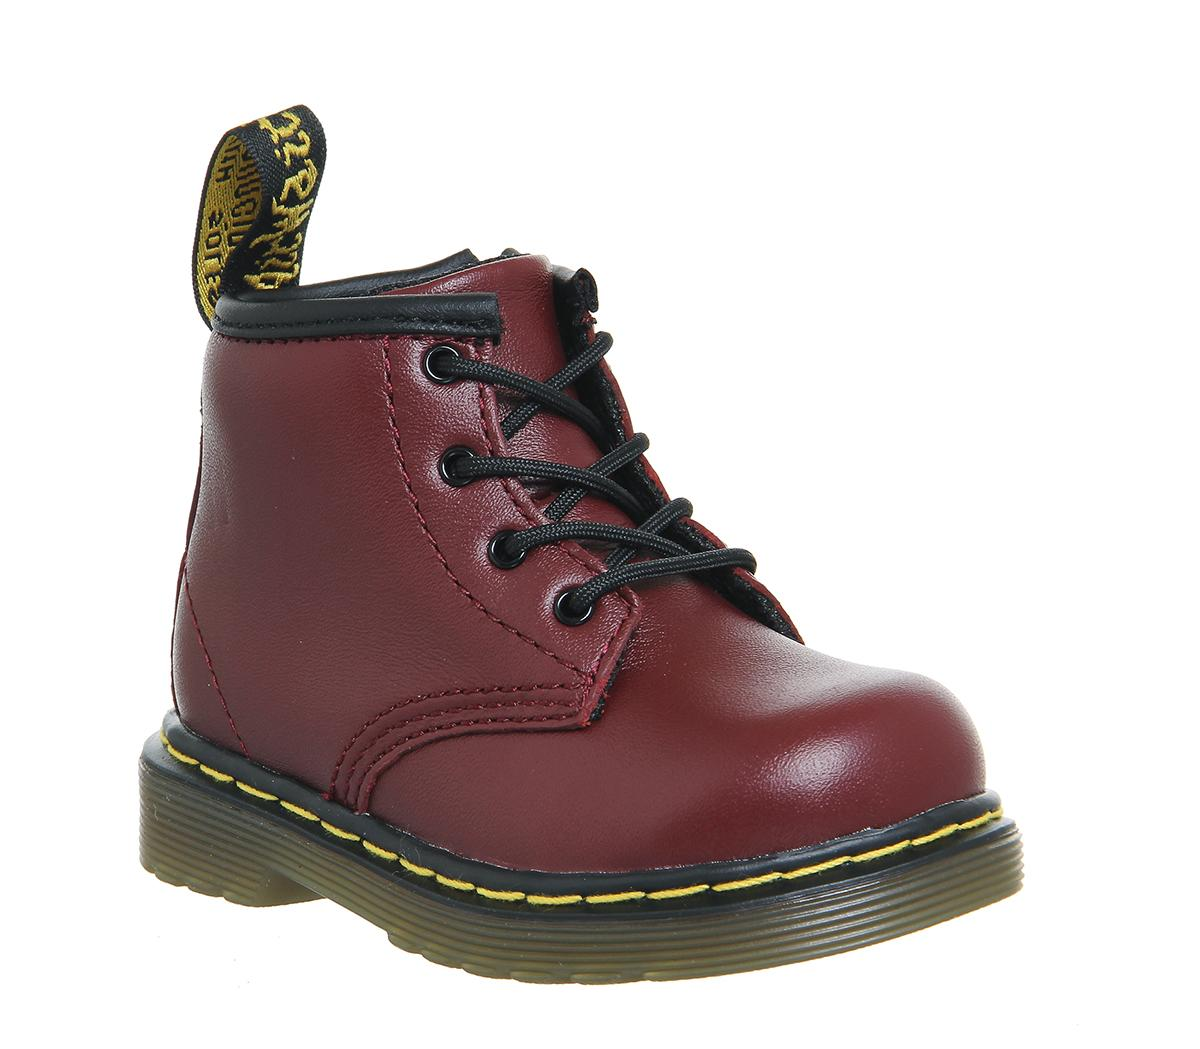 Dr. Martens Kids Lace Up Boots Inside